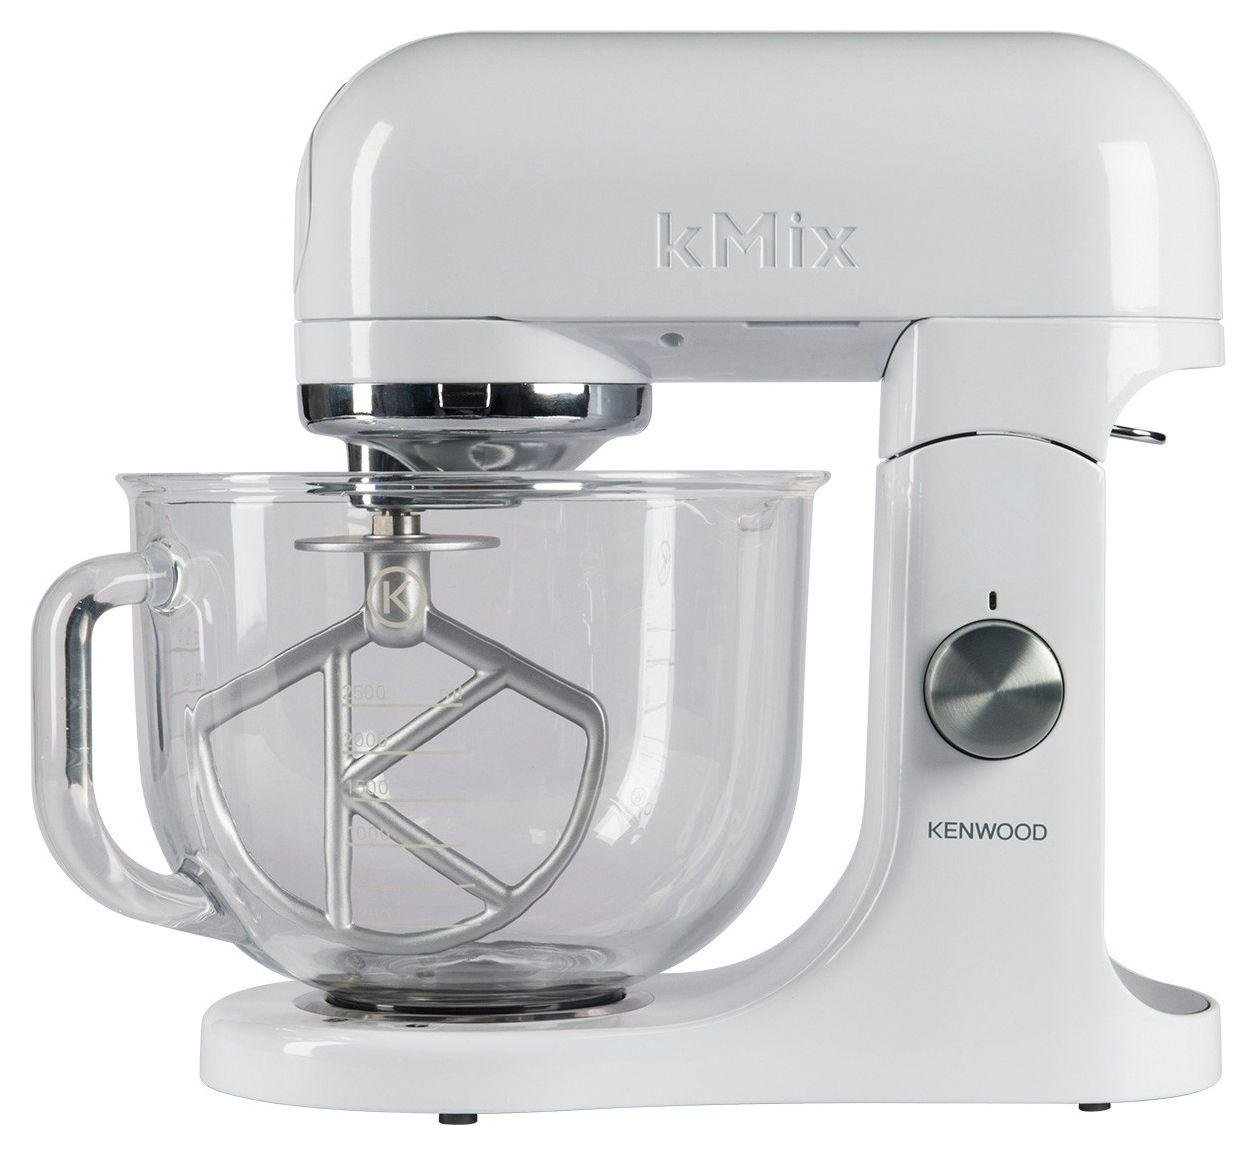 Kenwood - KMix Stand Mixer - White